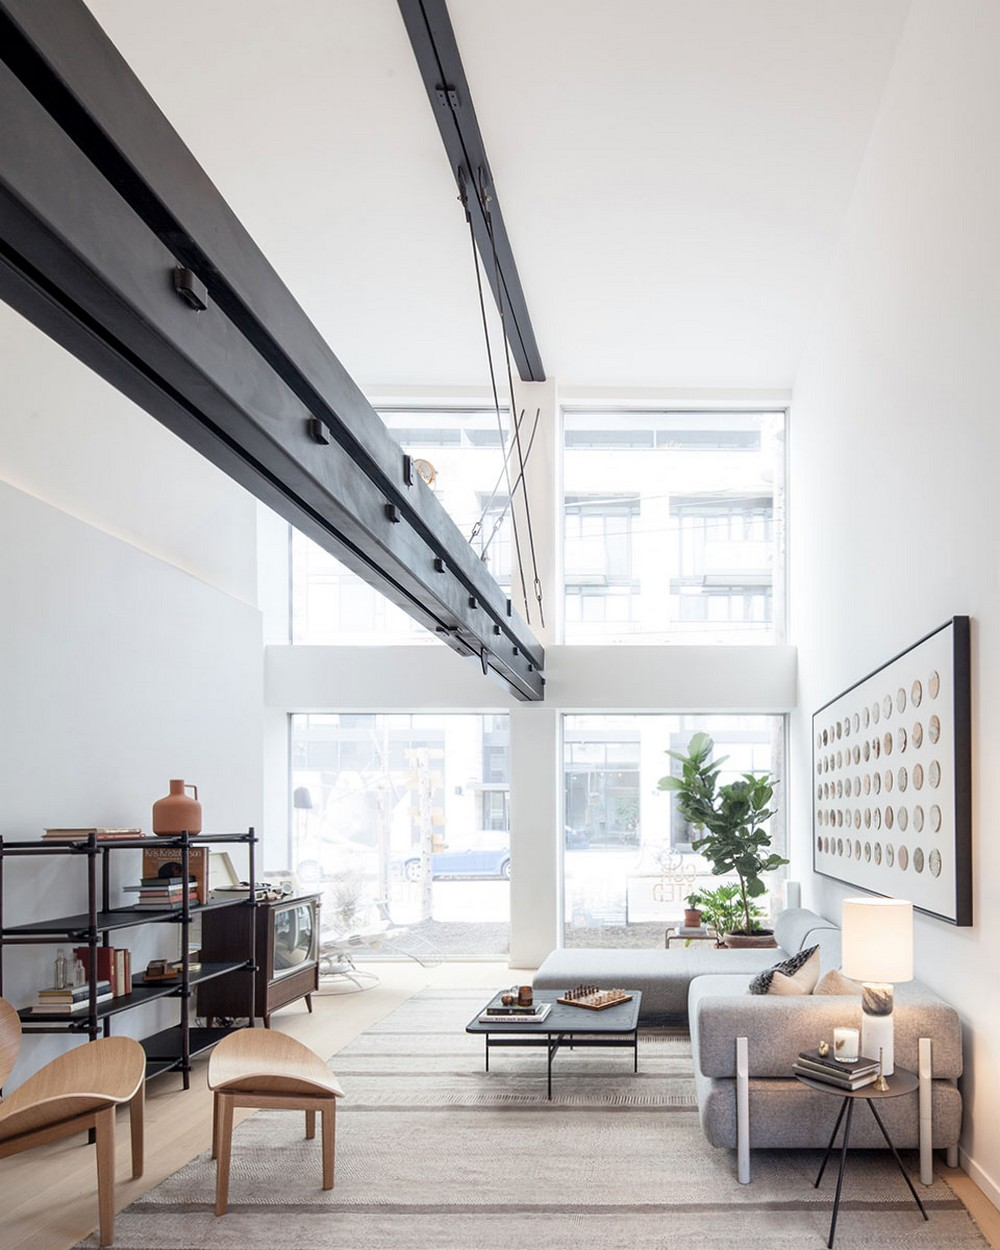 Top 20 Interior Designers From Toronto toronto Top 20 Interior Designers From Toronto mason studio